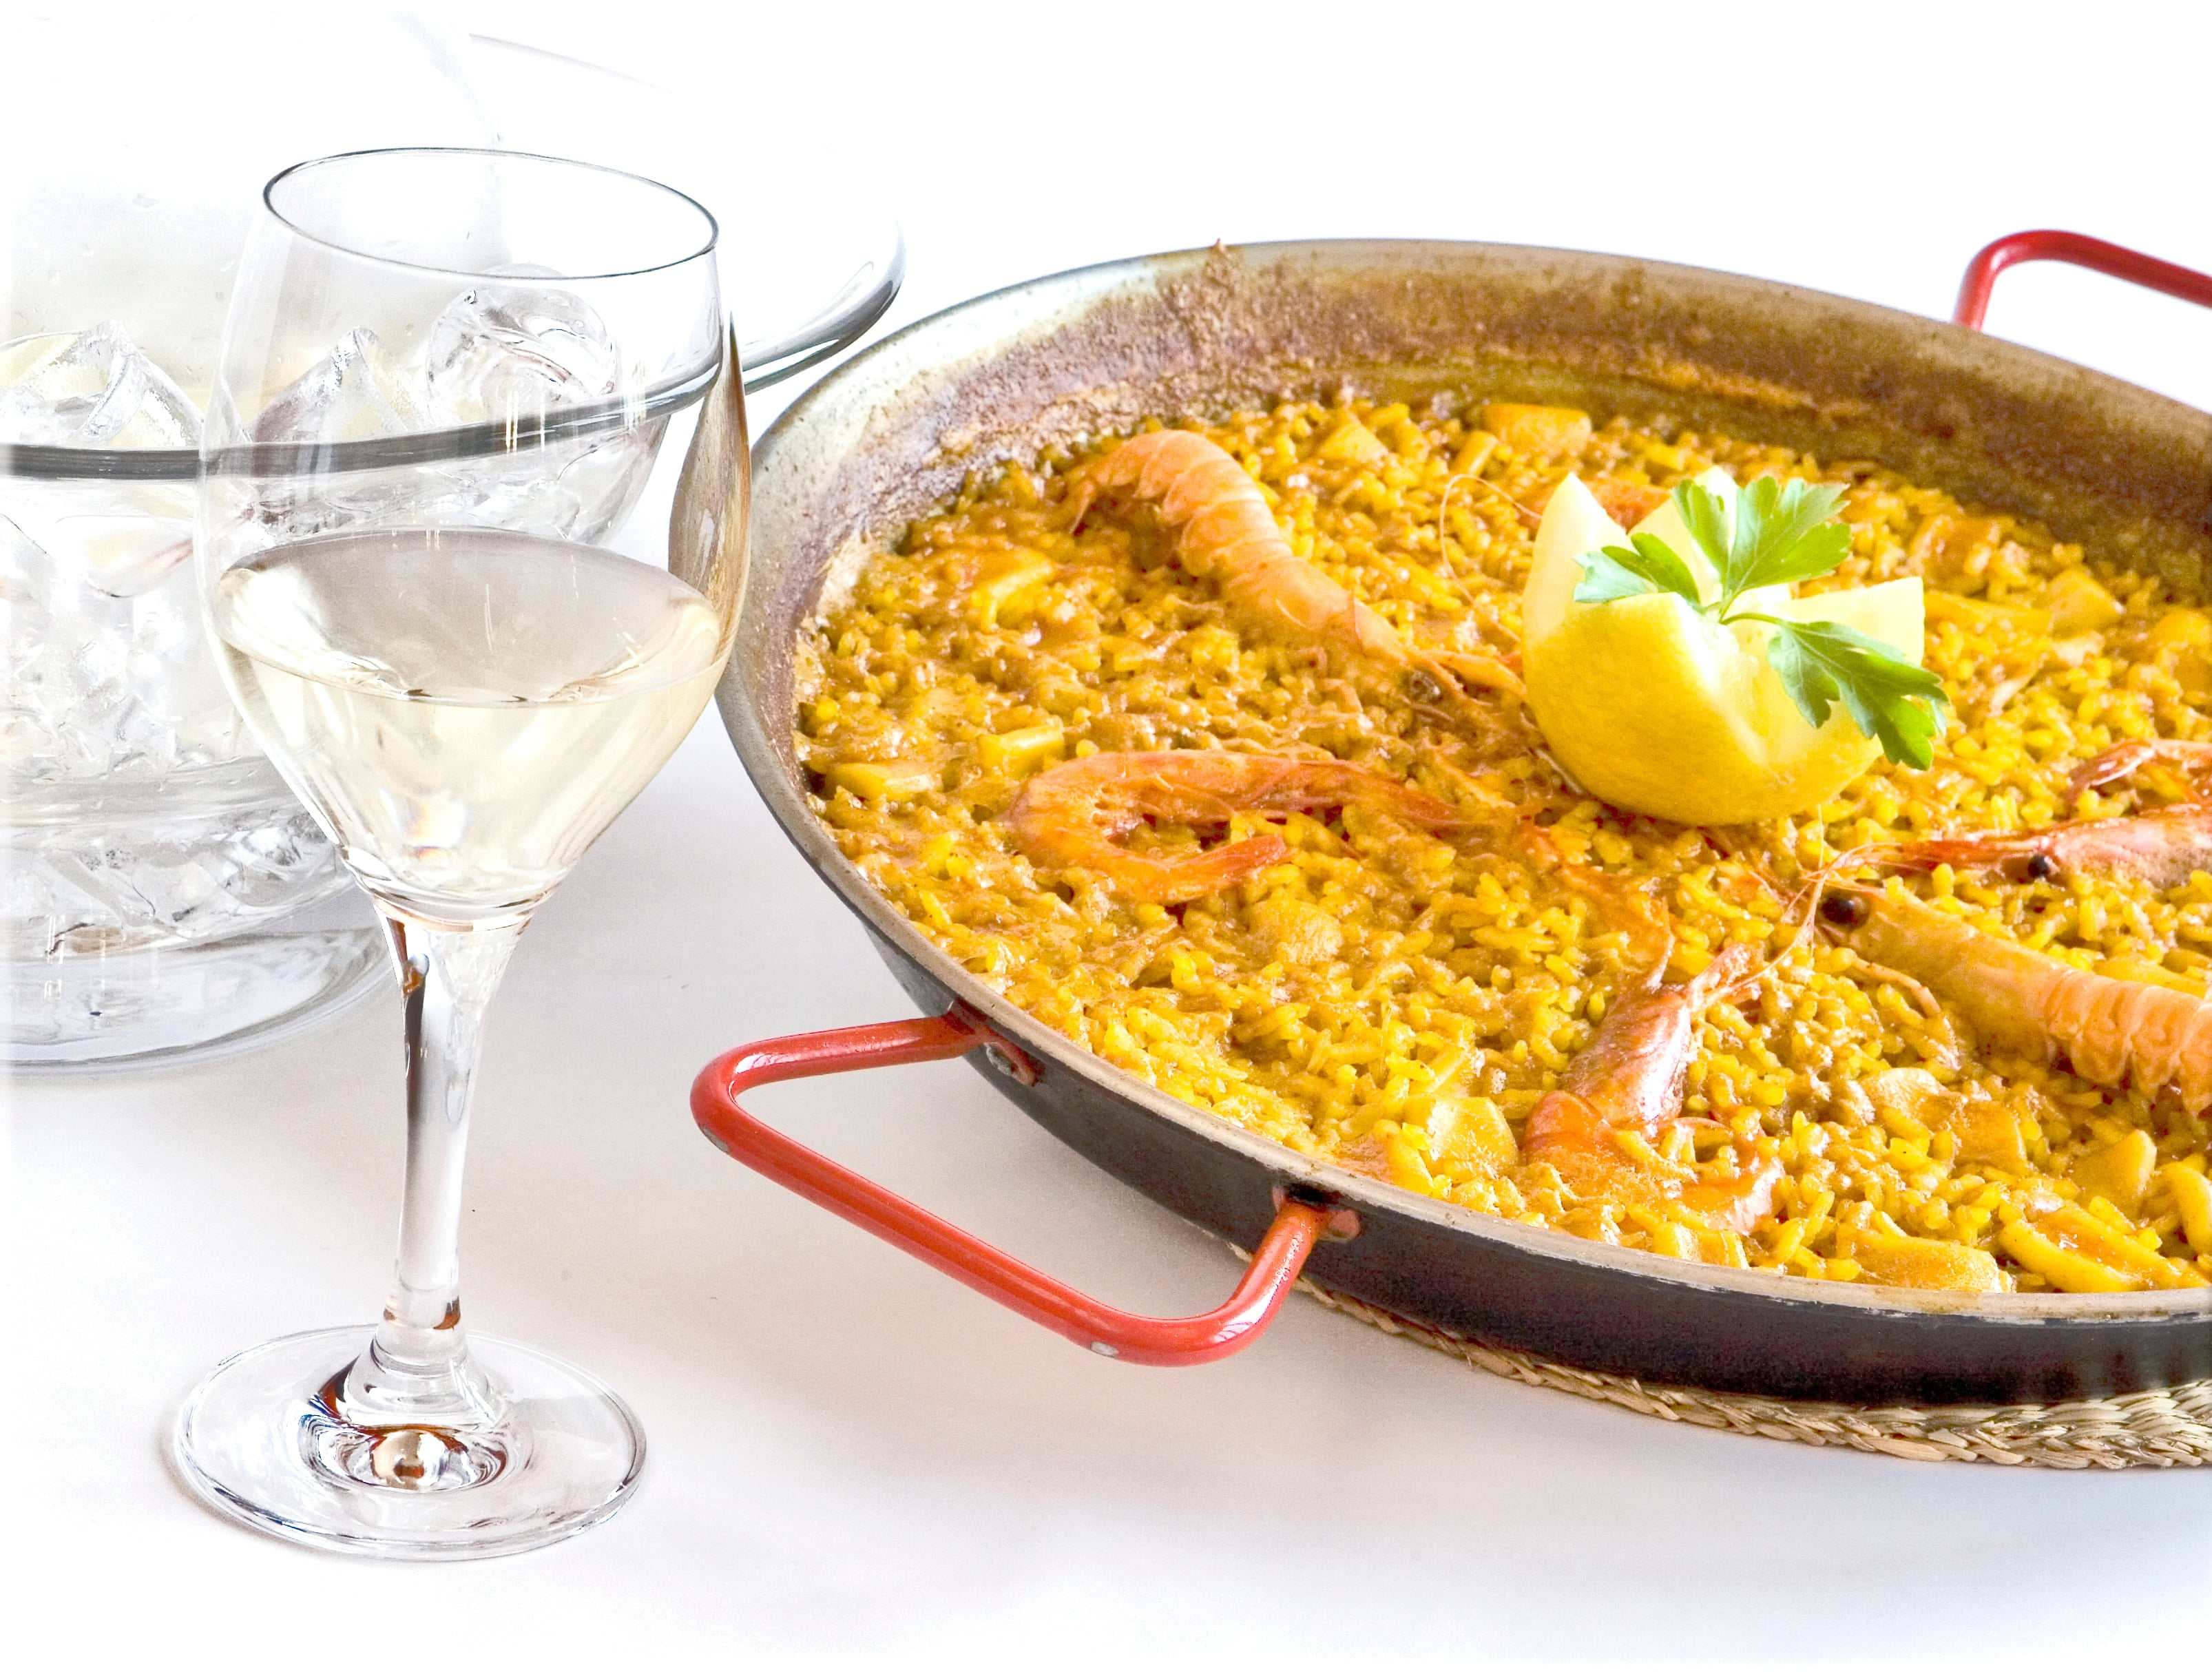 Fideuá Restaurante Isa